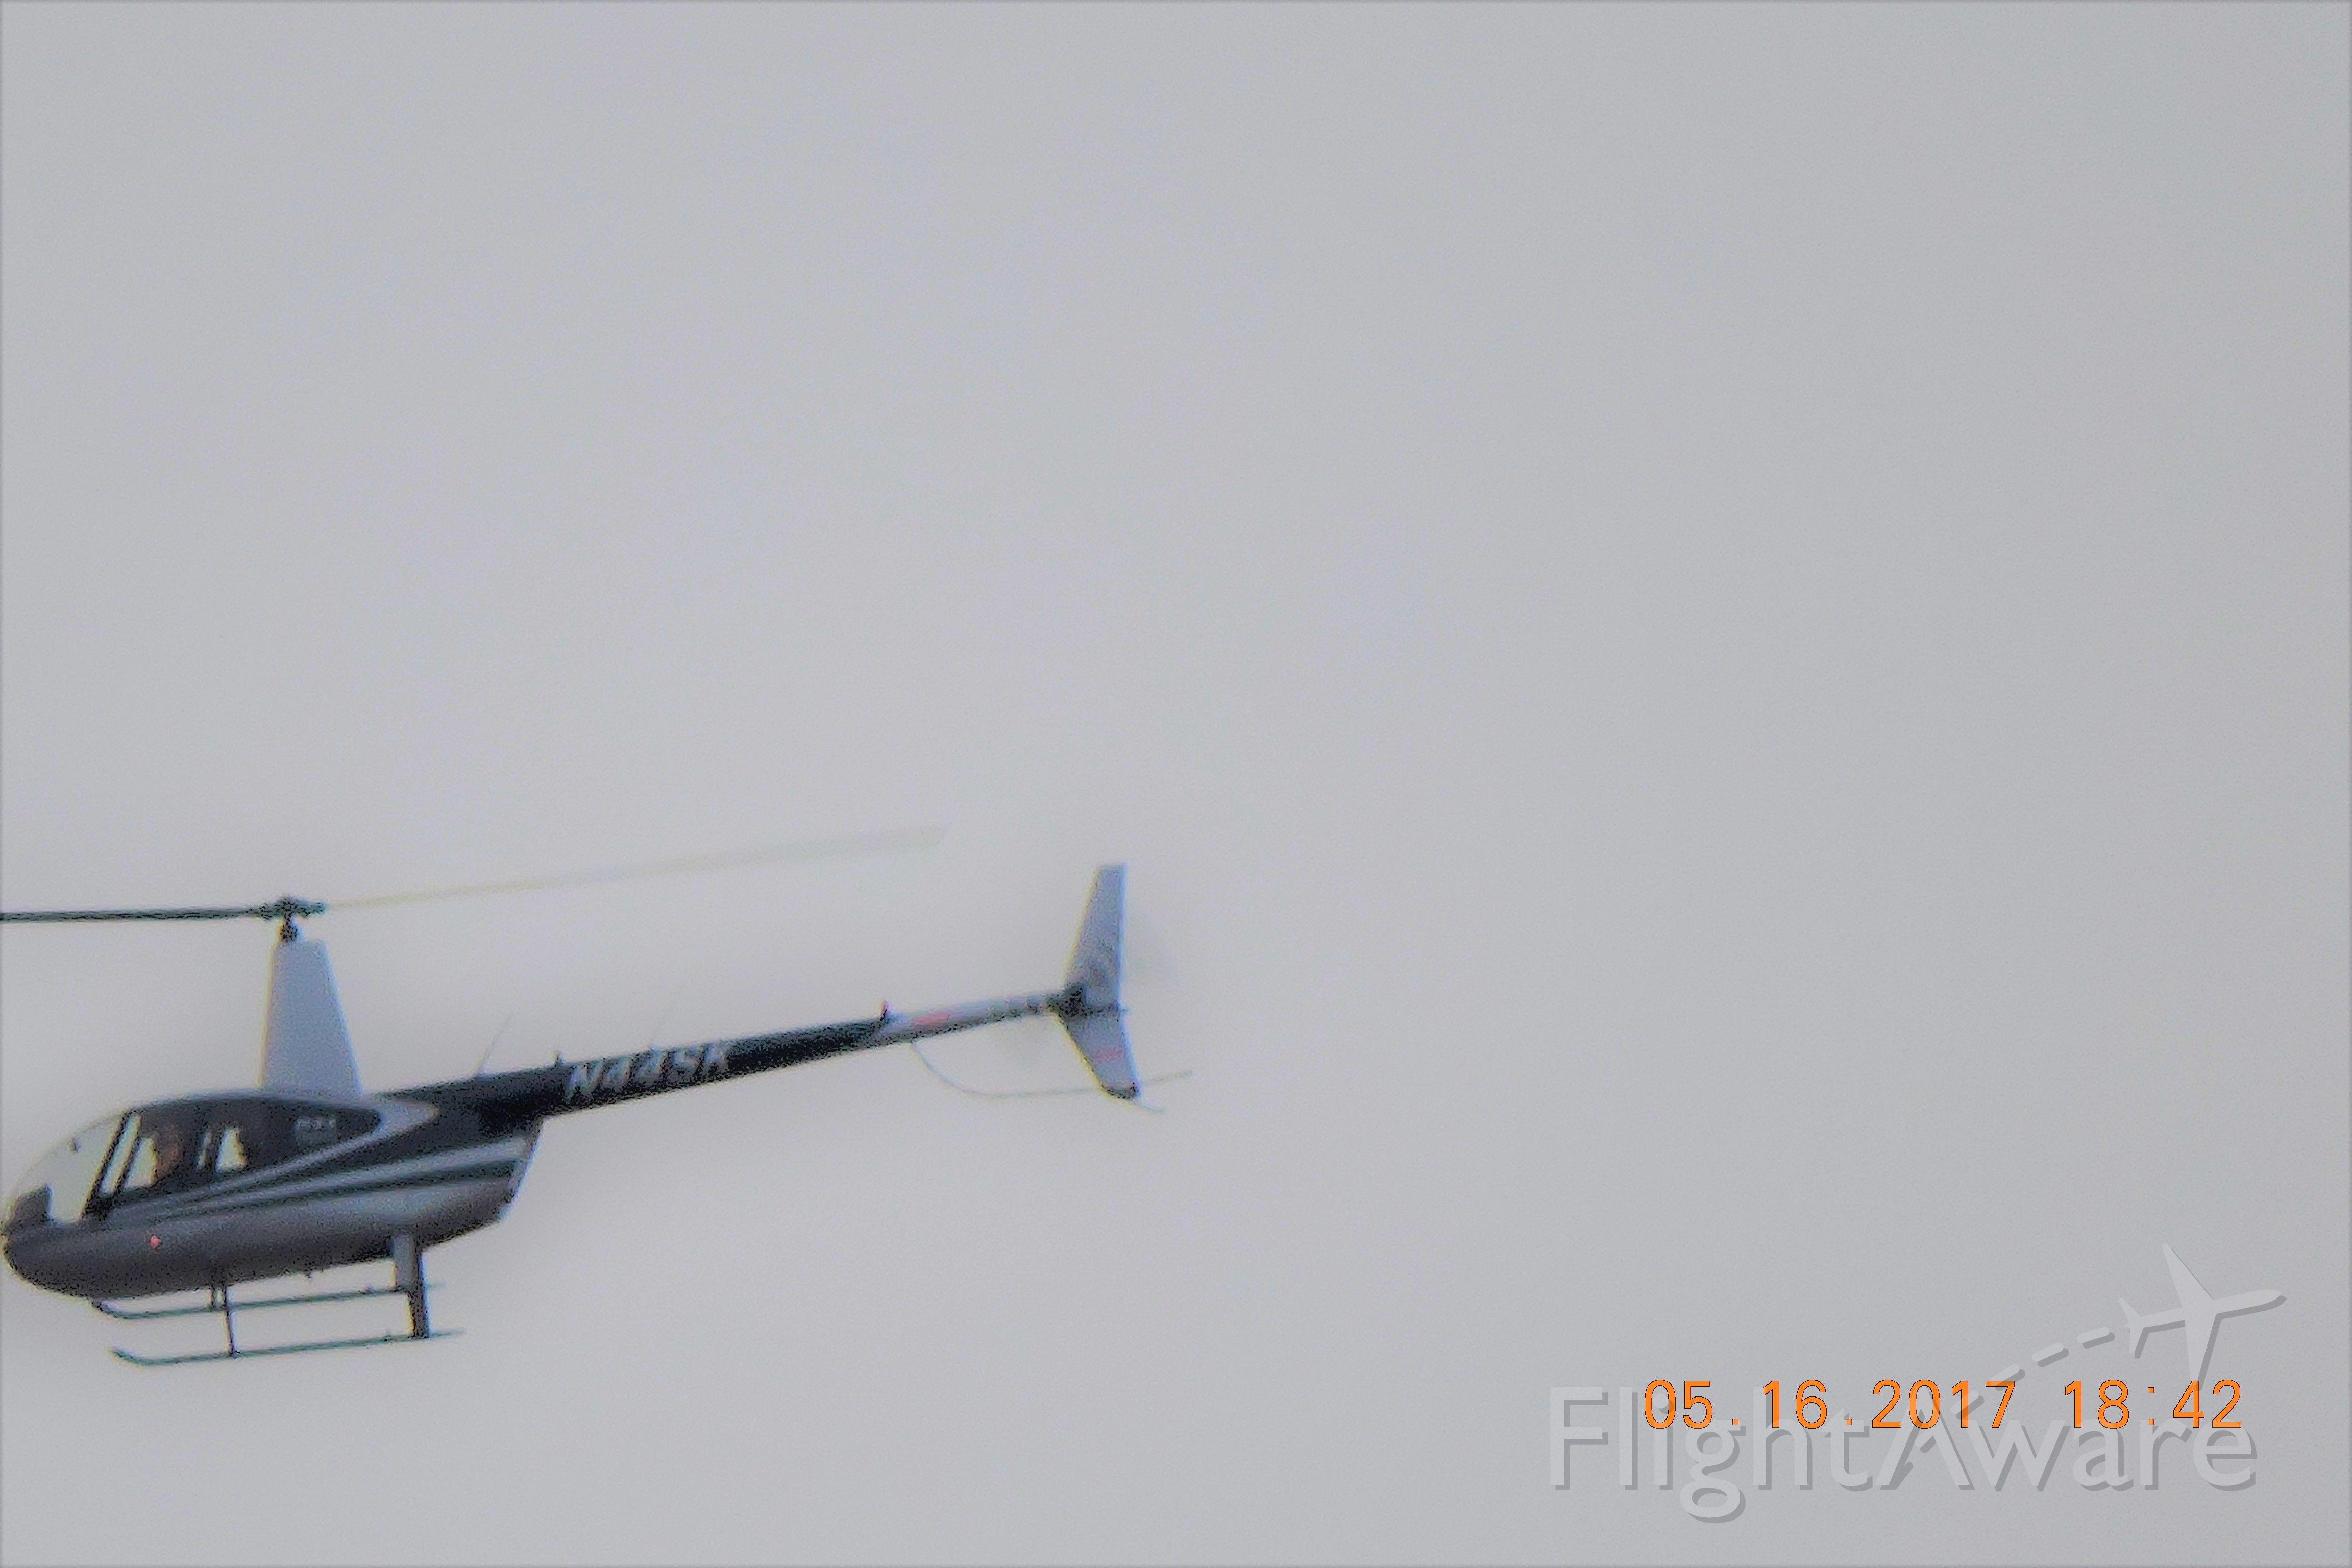 Piper Malibu Mirage (N44SK)